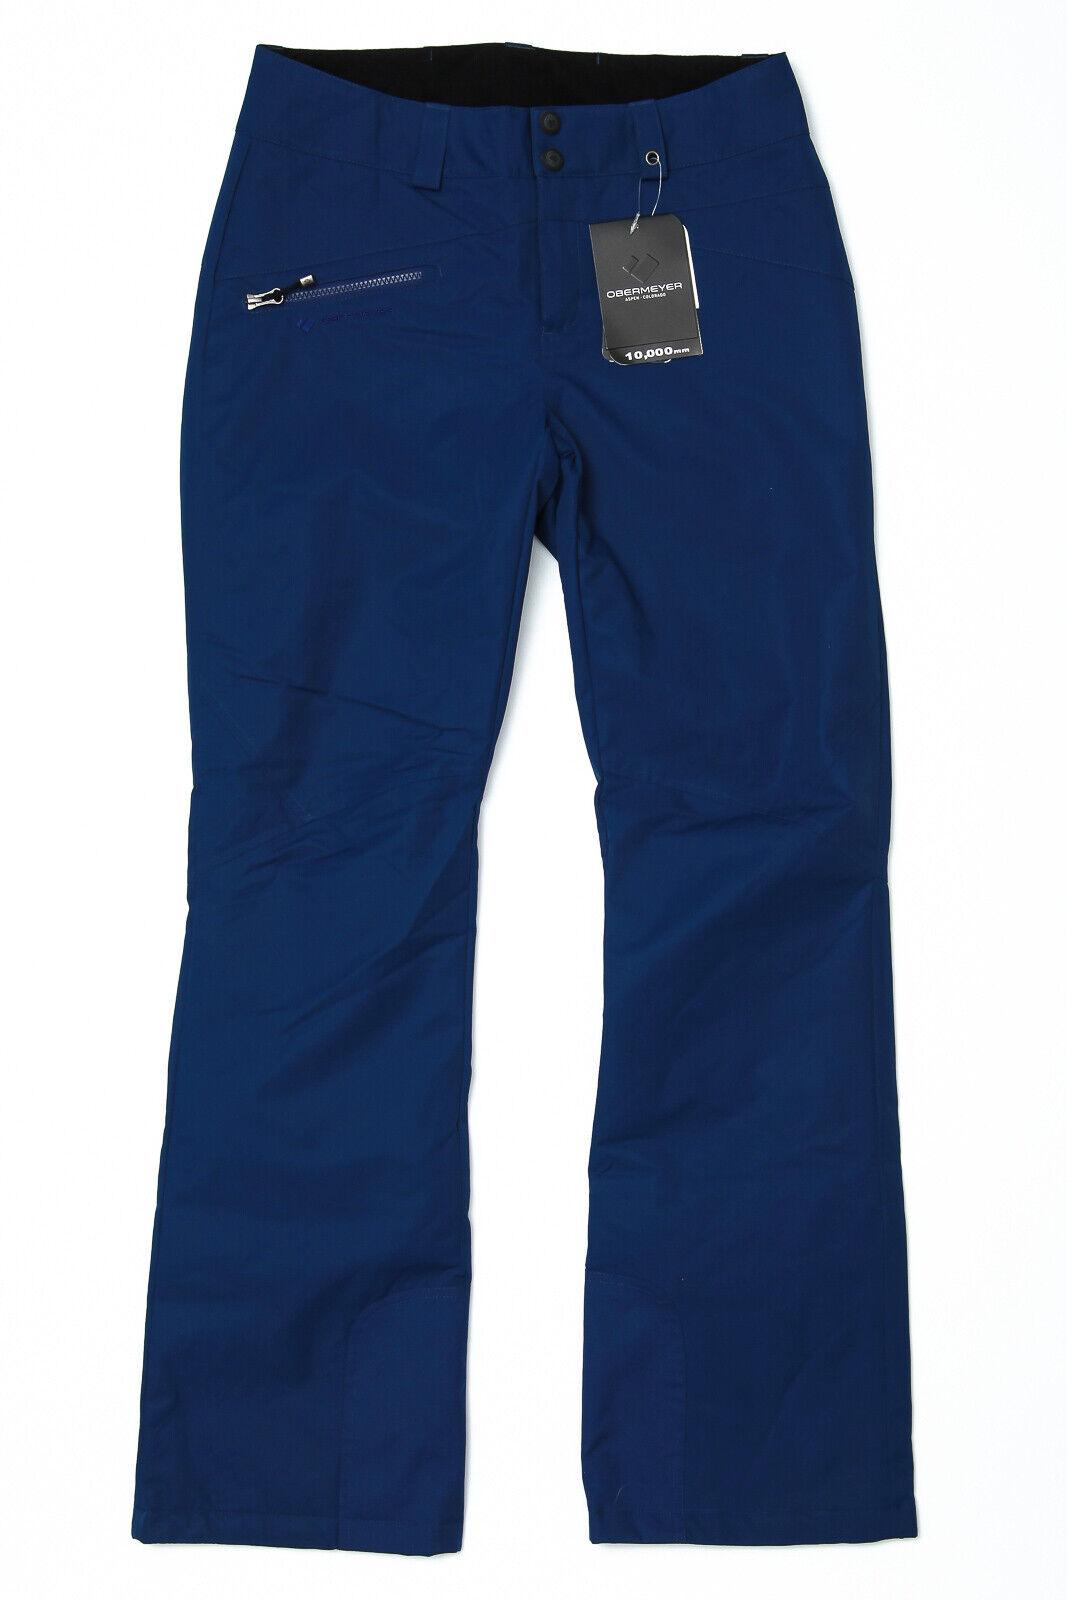 Obermeyer Malta Ski Snow Pants Dusk Blau - damen 8 Long